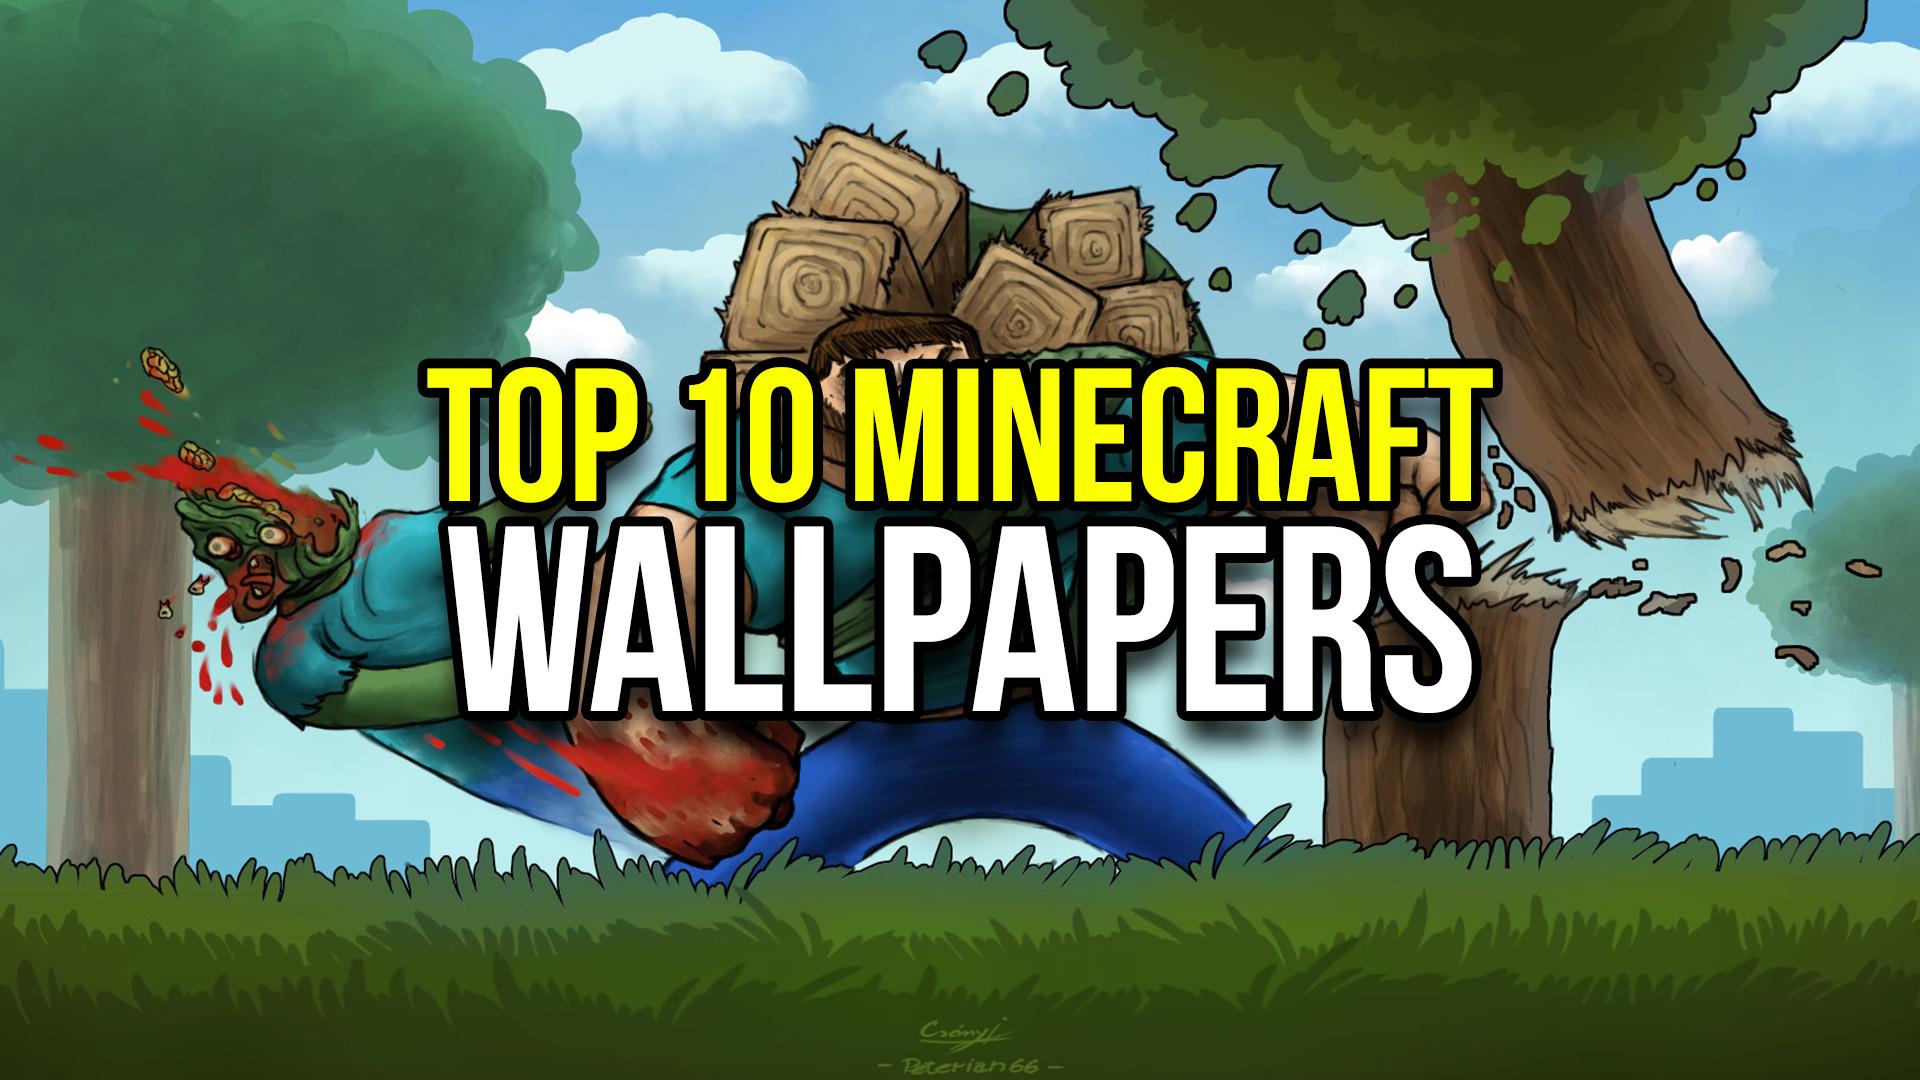 Top 10 Minecraft Wallpapers   MinecraftRocket 1920x1080